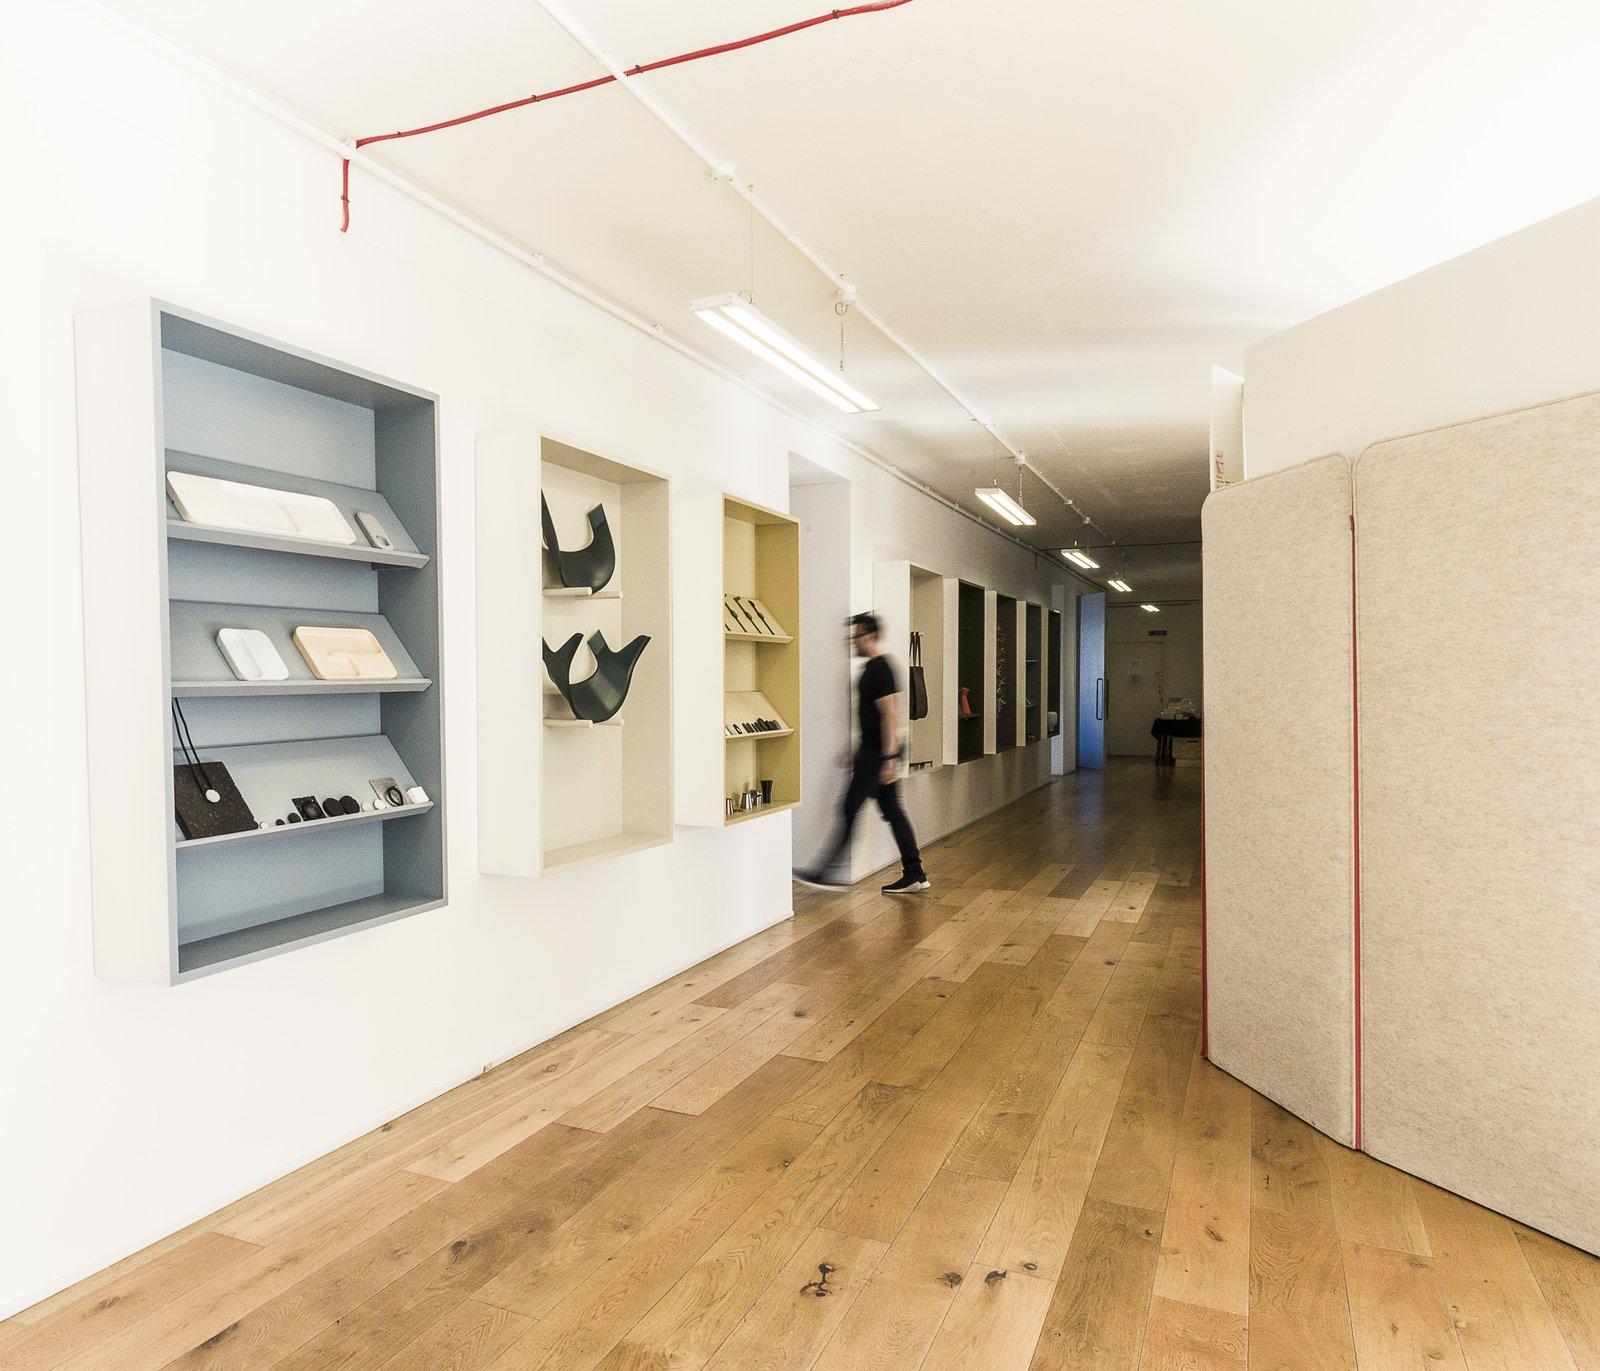 Benjamin hubert london studio dwell